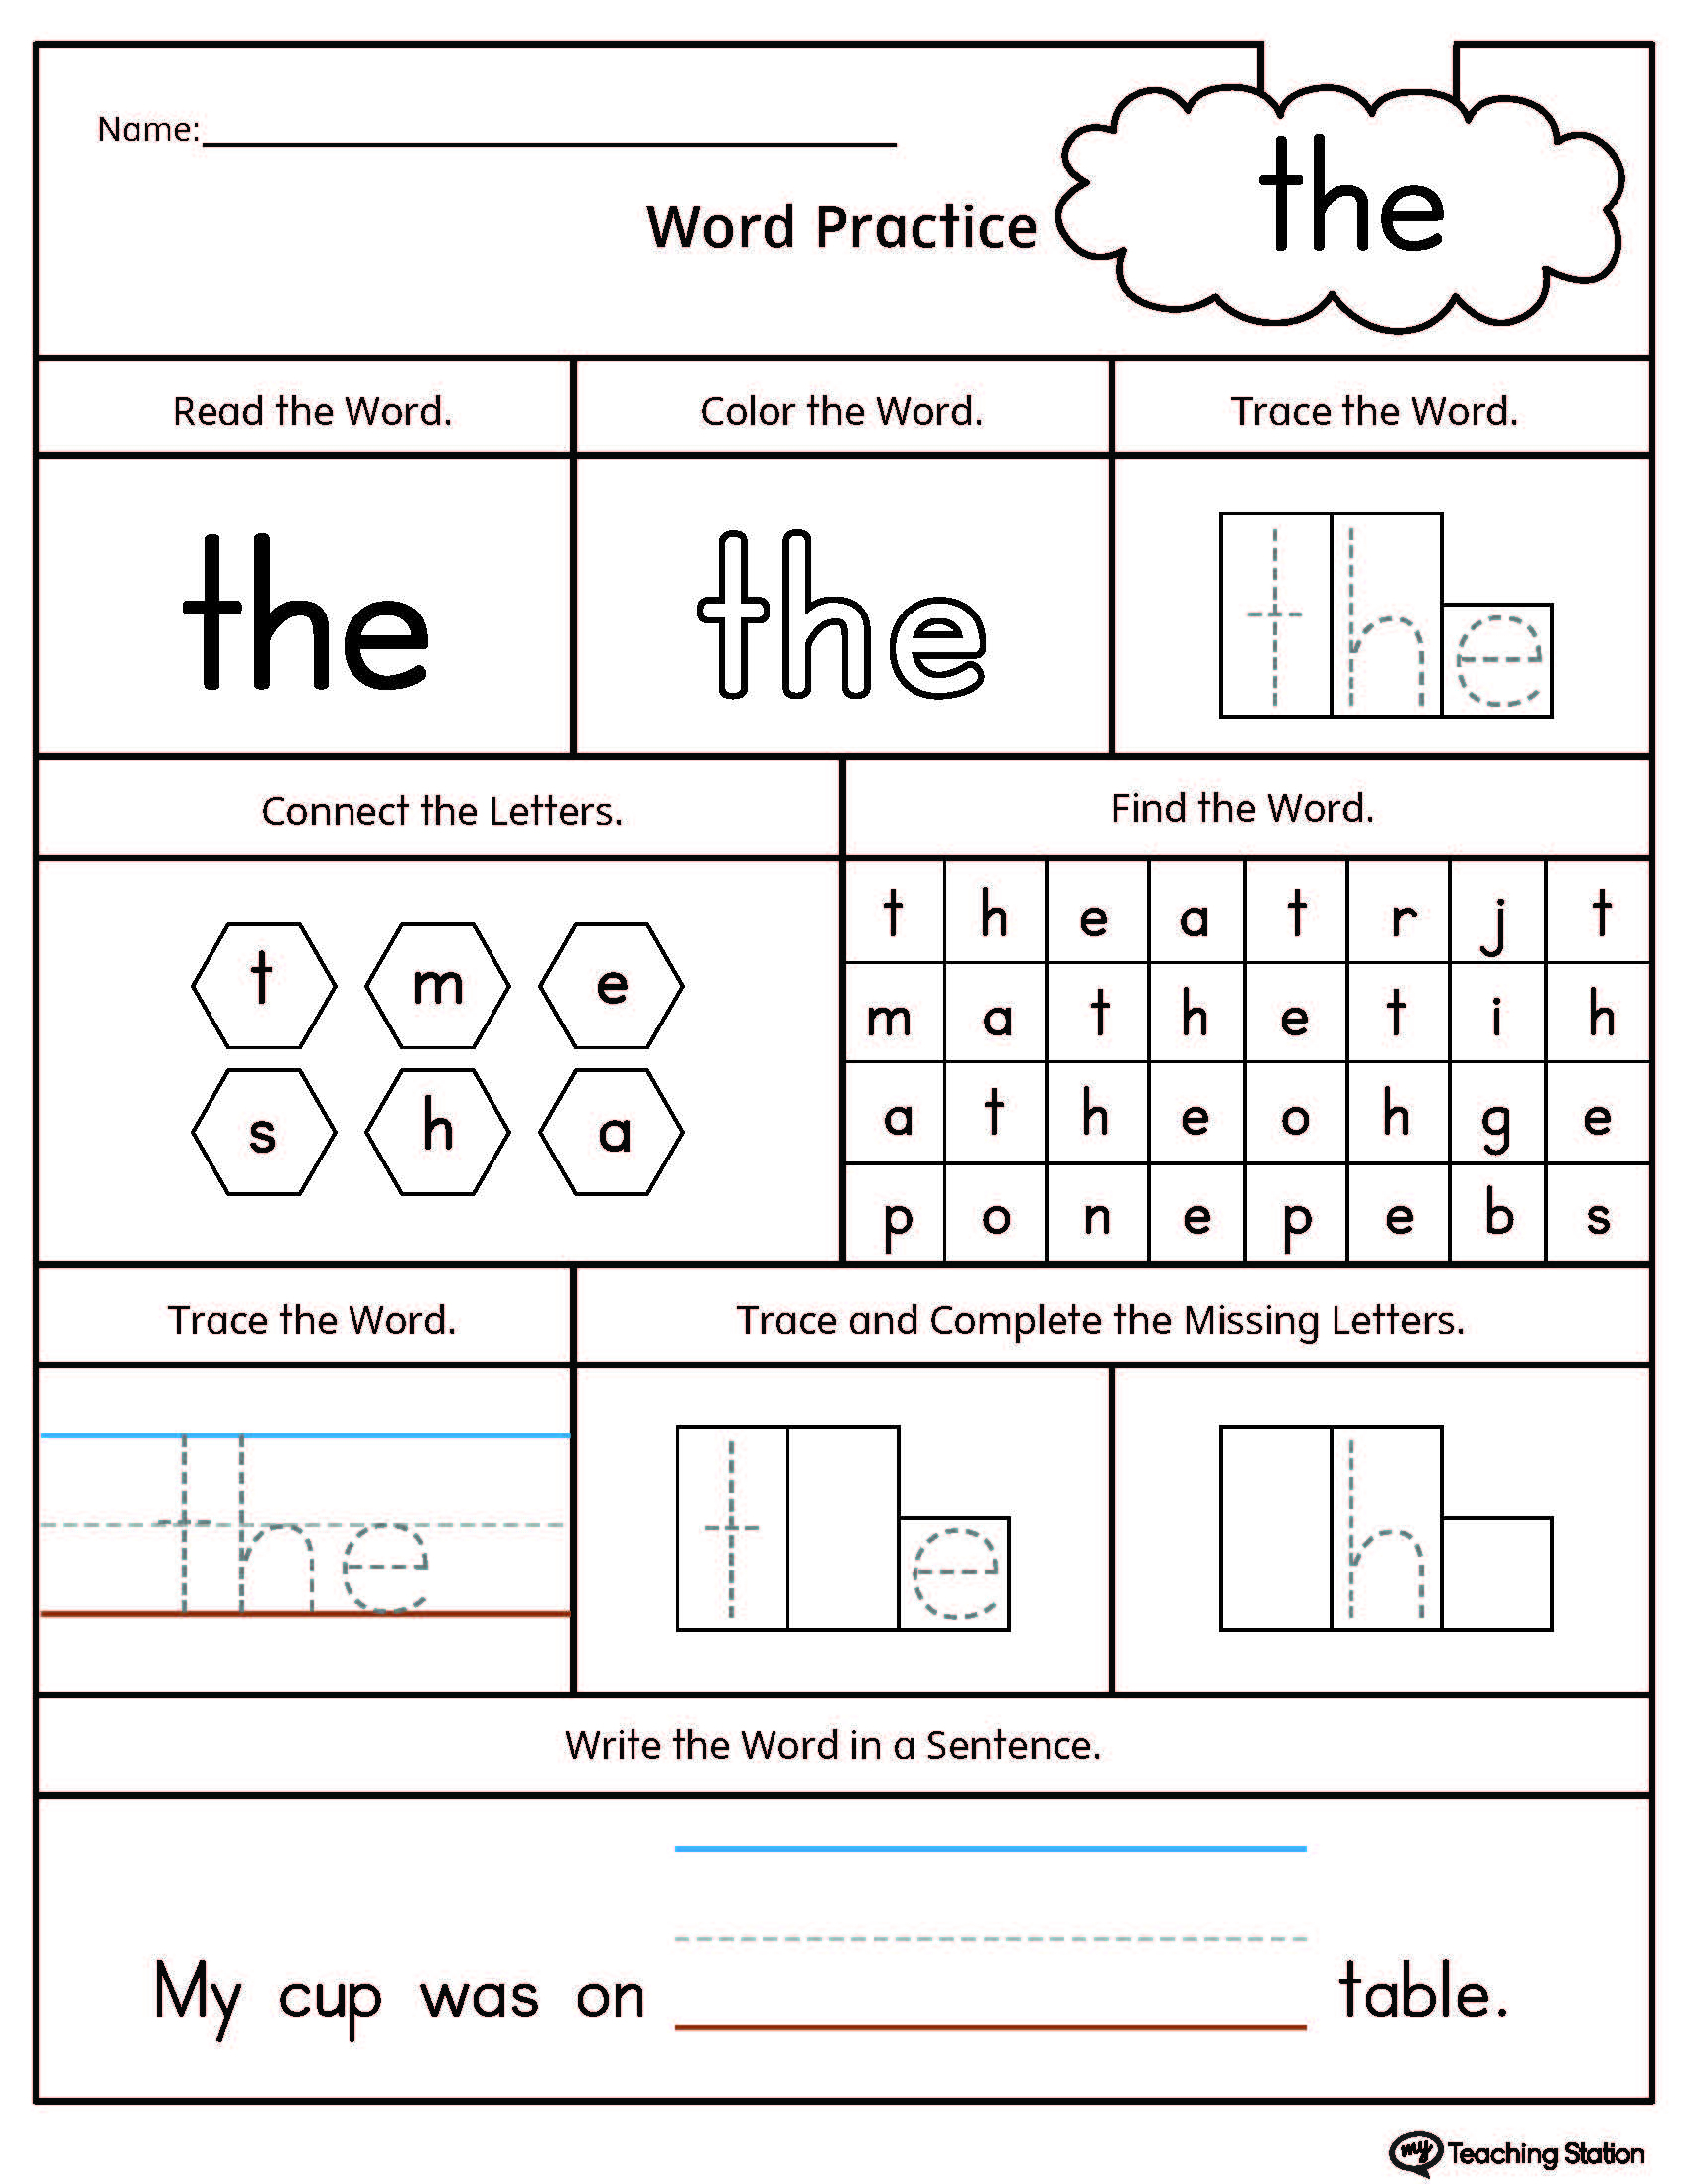 Sight Word The Printable Worksheet | Myteachingstation | Printable Worksheets Com